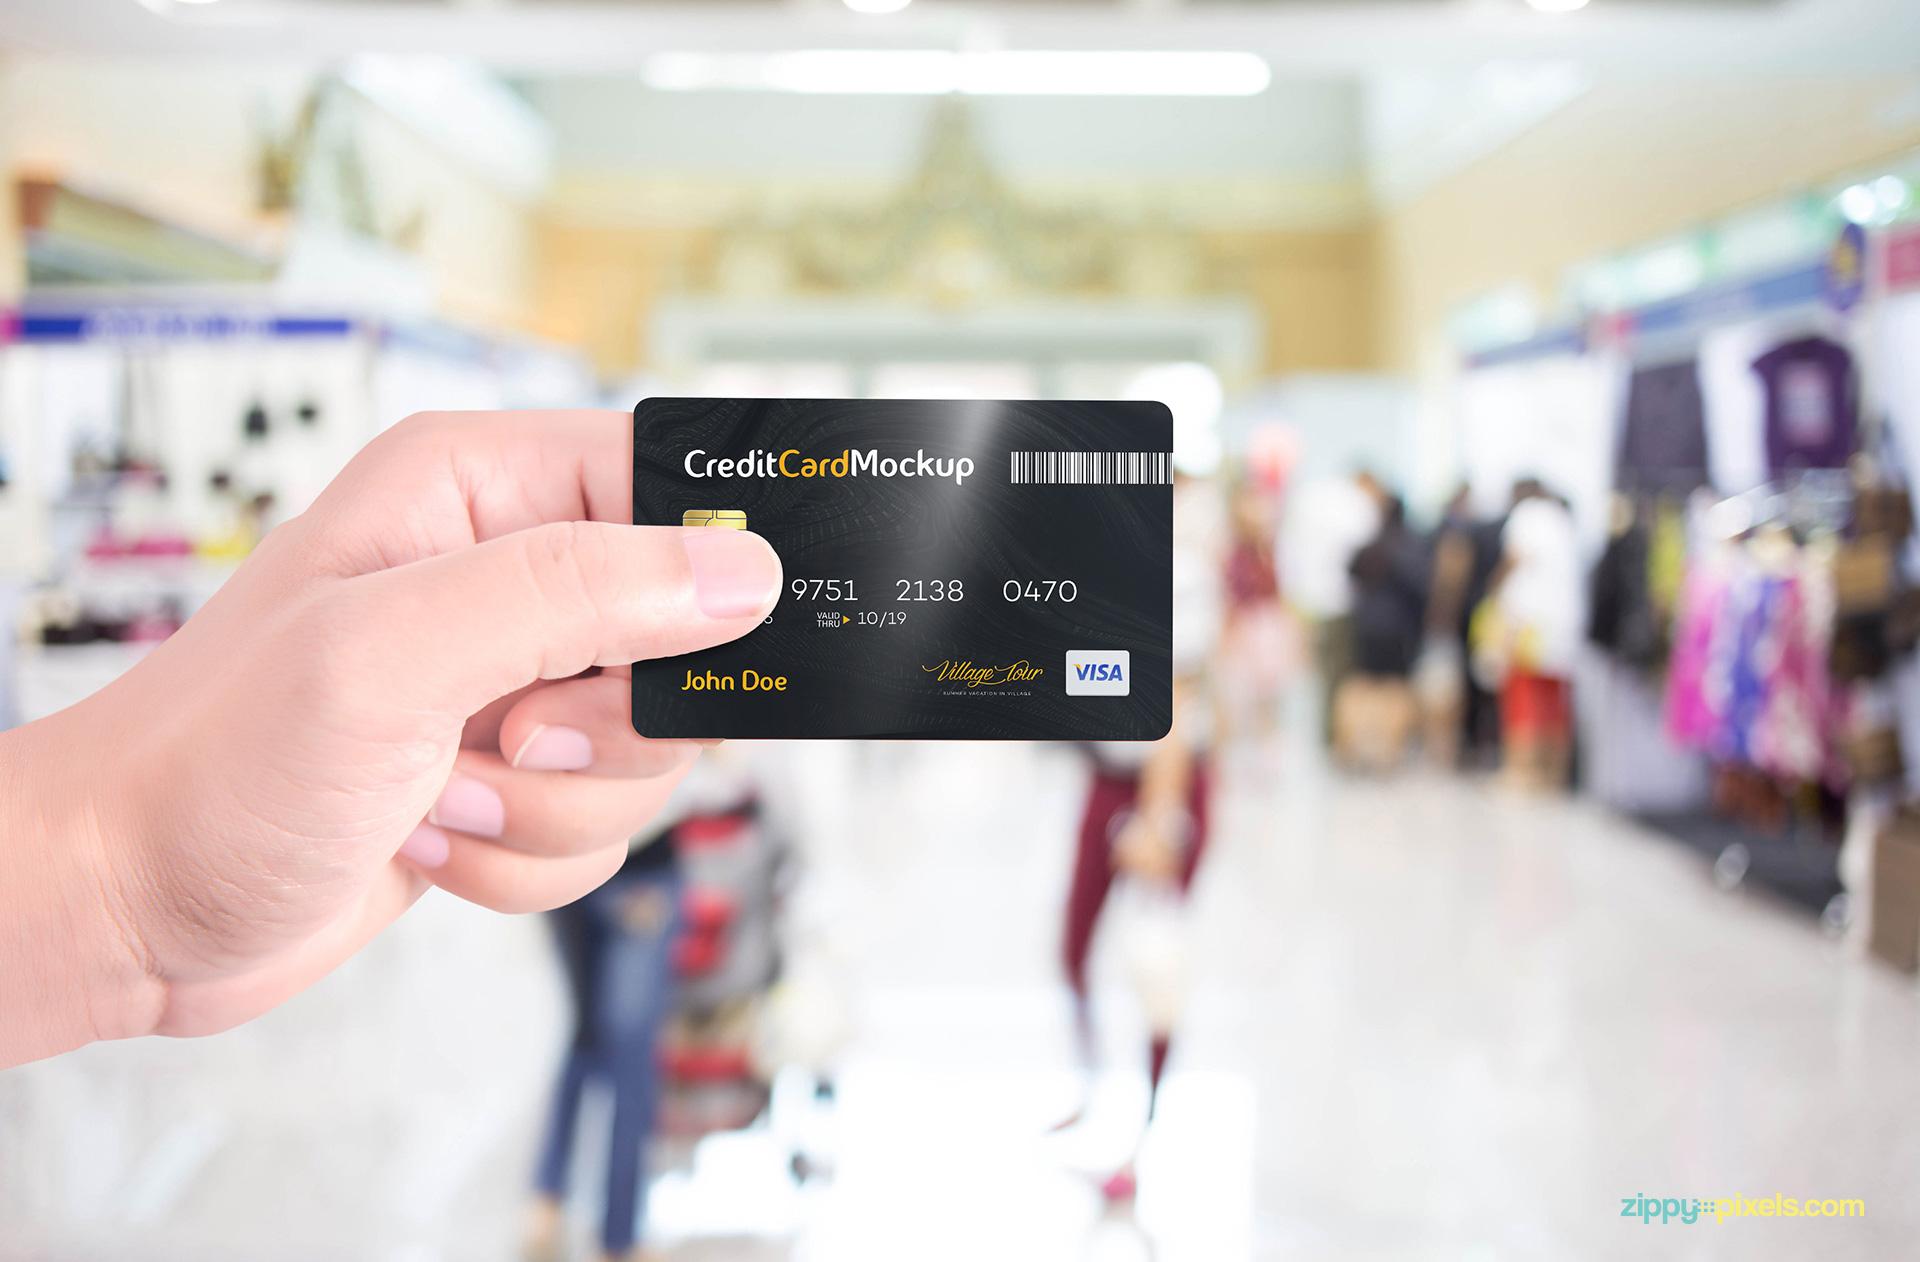 01-free-credit-card-mockup-824x542